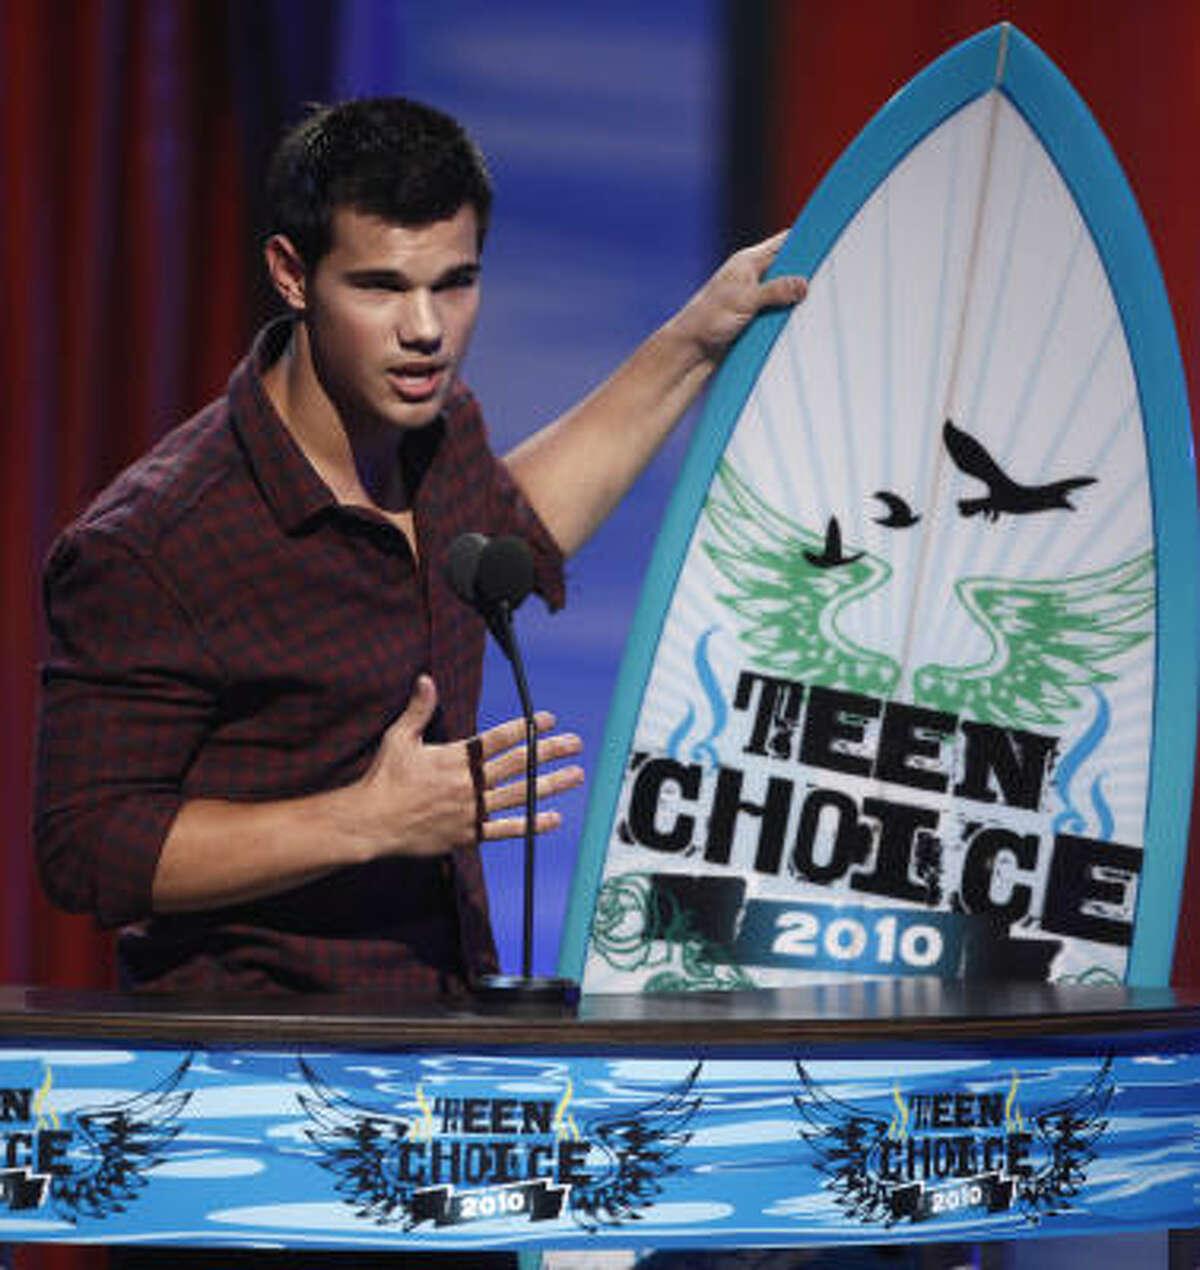 Twilight 's Taylor Lautner got serious when he won the best smile award.